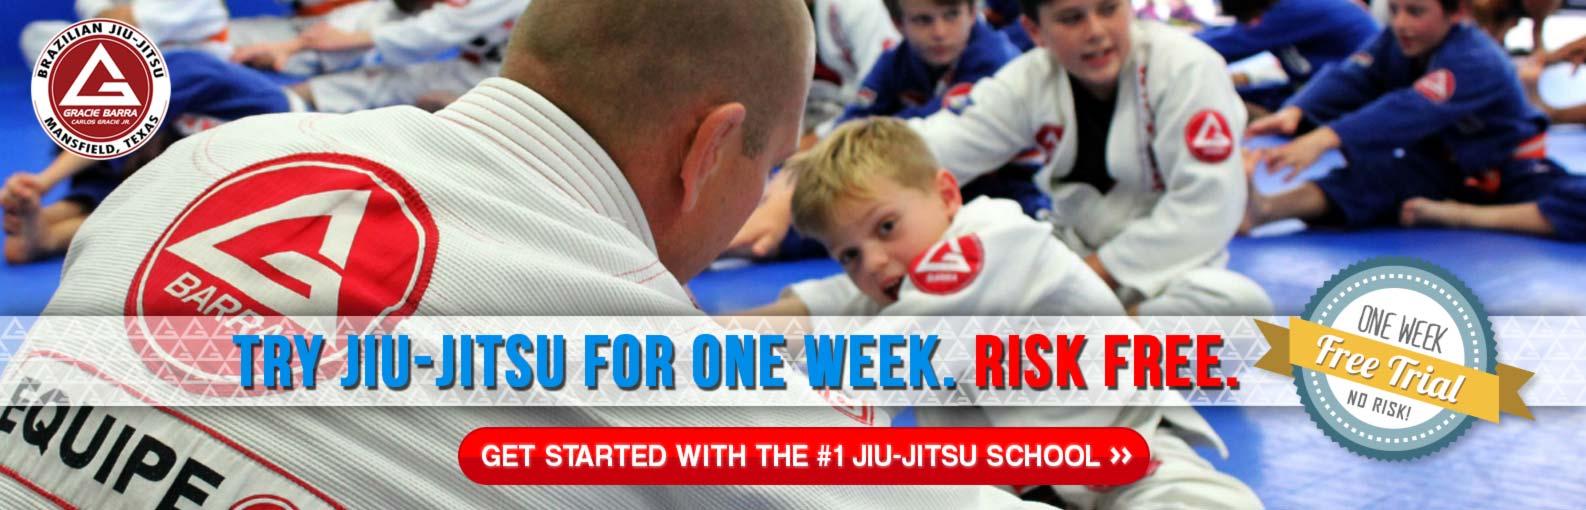 gracie barra, gracie barra mansfield, jiu jitsu, brazilian jiu jitsu, bjj, jujutsu, free trial, free 30 day trial, free 30 days, free jiu jitsu